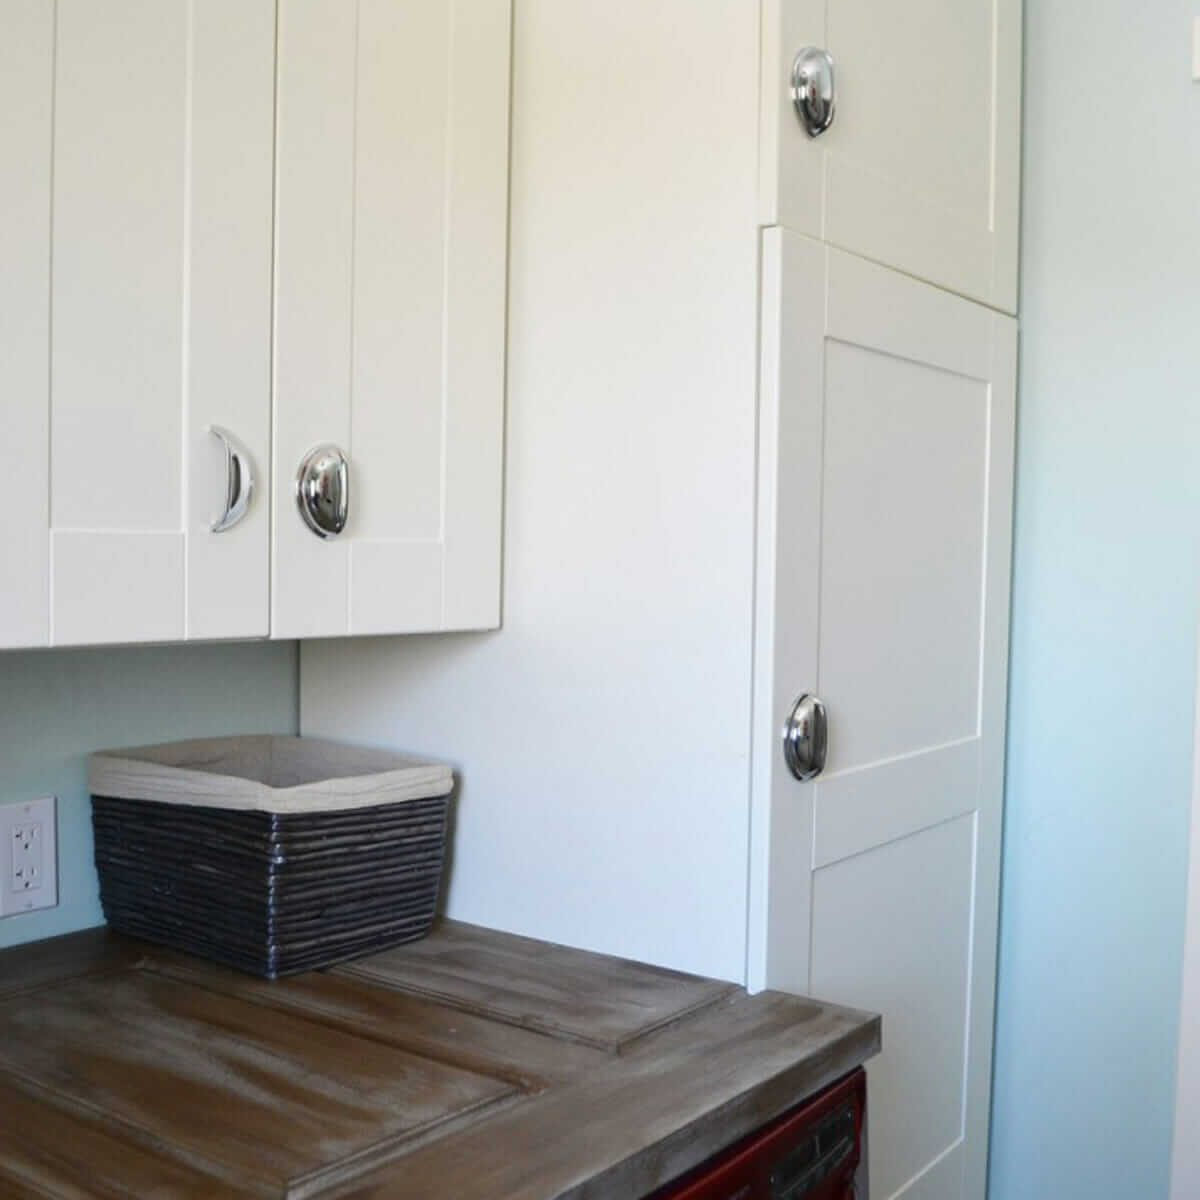 Vintage-Red-Aqua-Pegboard-Laundry-Room-Design-Ideas-13-714x1000 cupboards laundry room